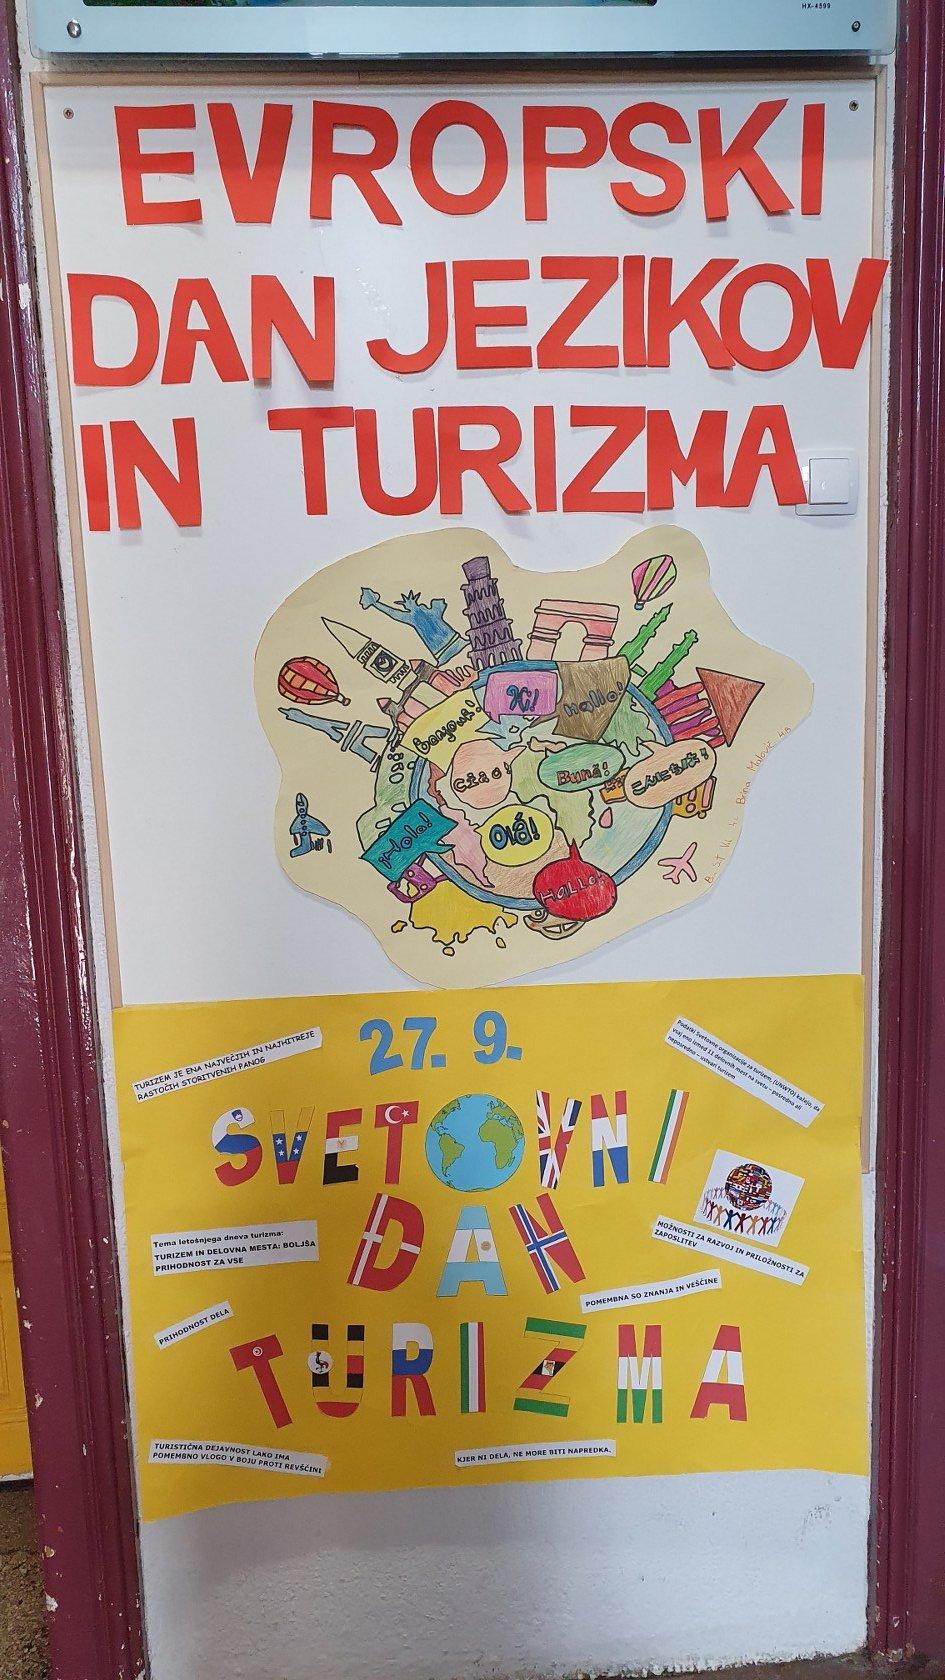 2020_09_26_dan_jezikov_turizma-12